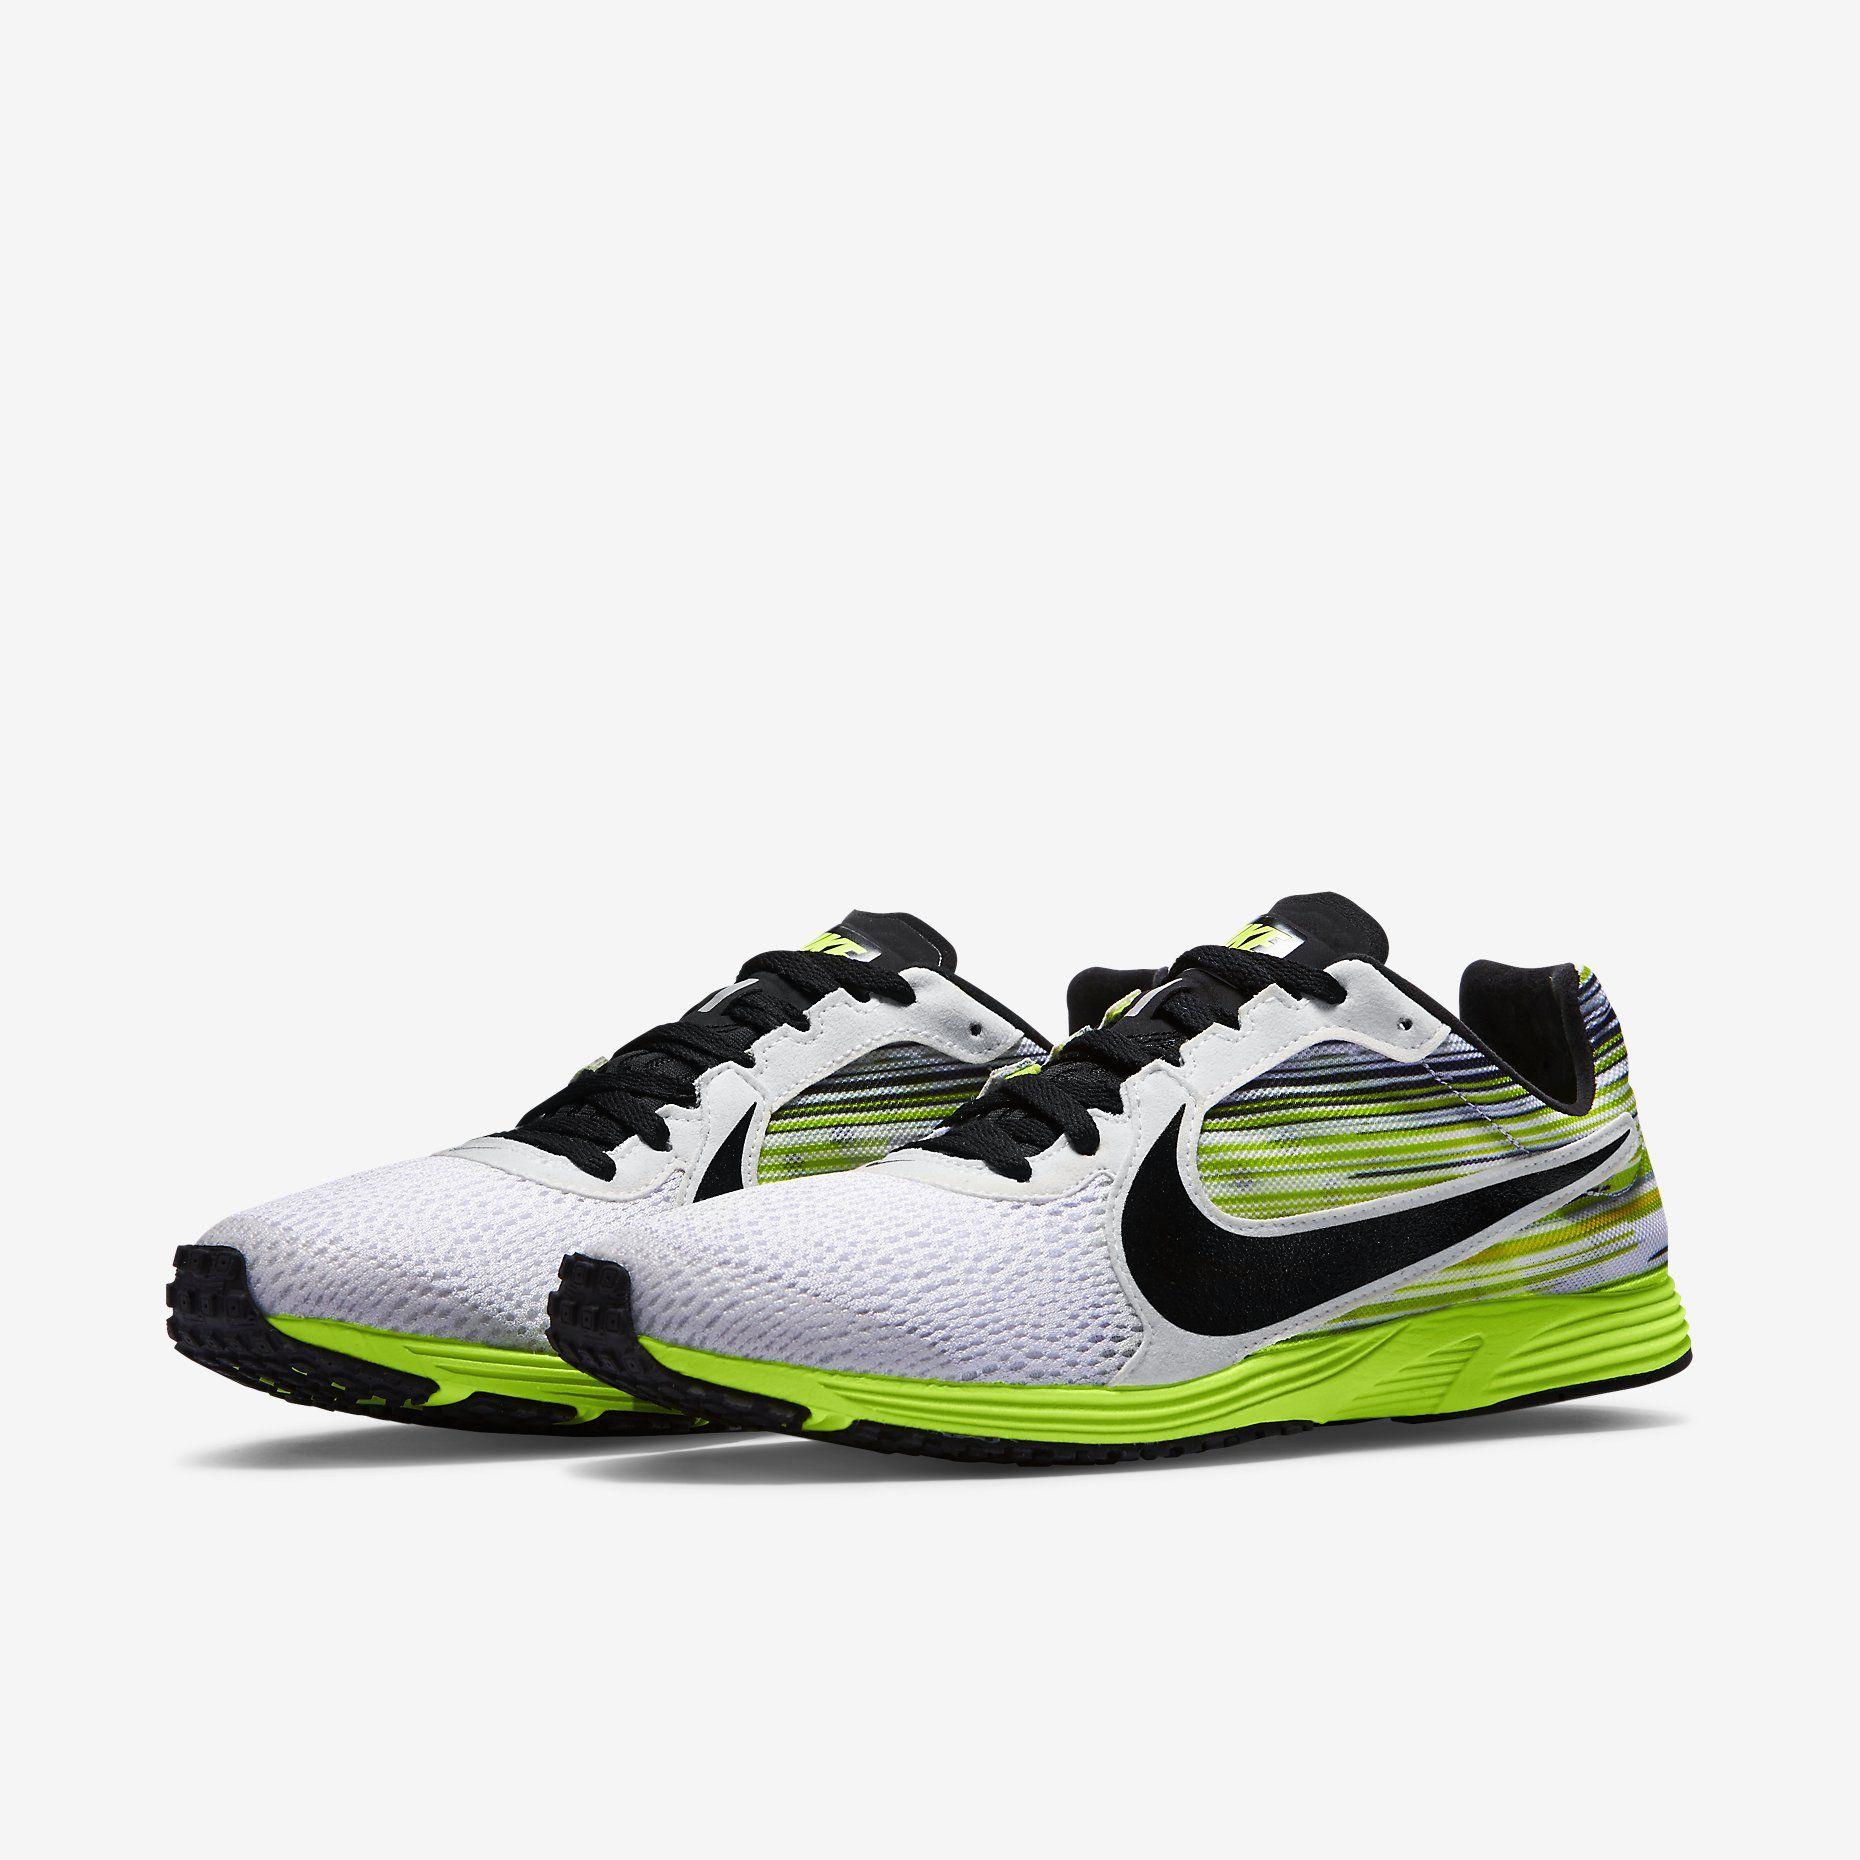 89a966643871f Nike Zoom Streak LT 2 Unisex Running Shoe (Men s Sizing). Nike Store ...